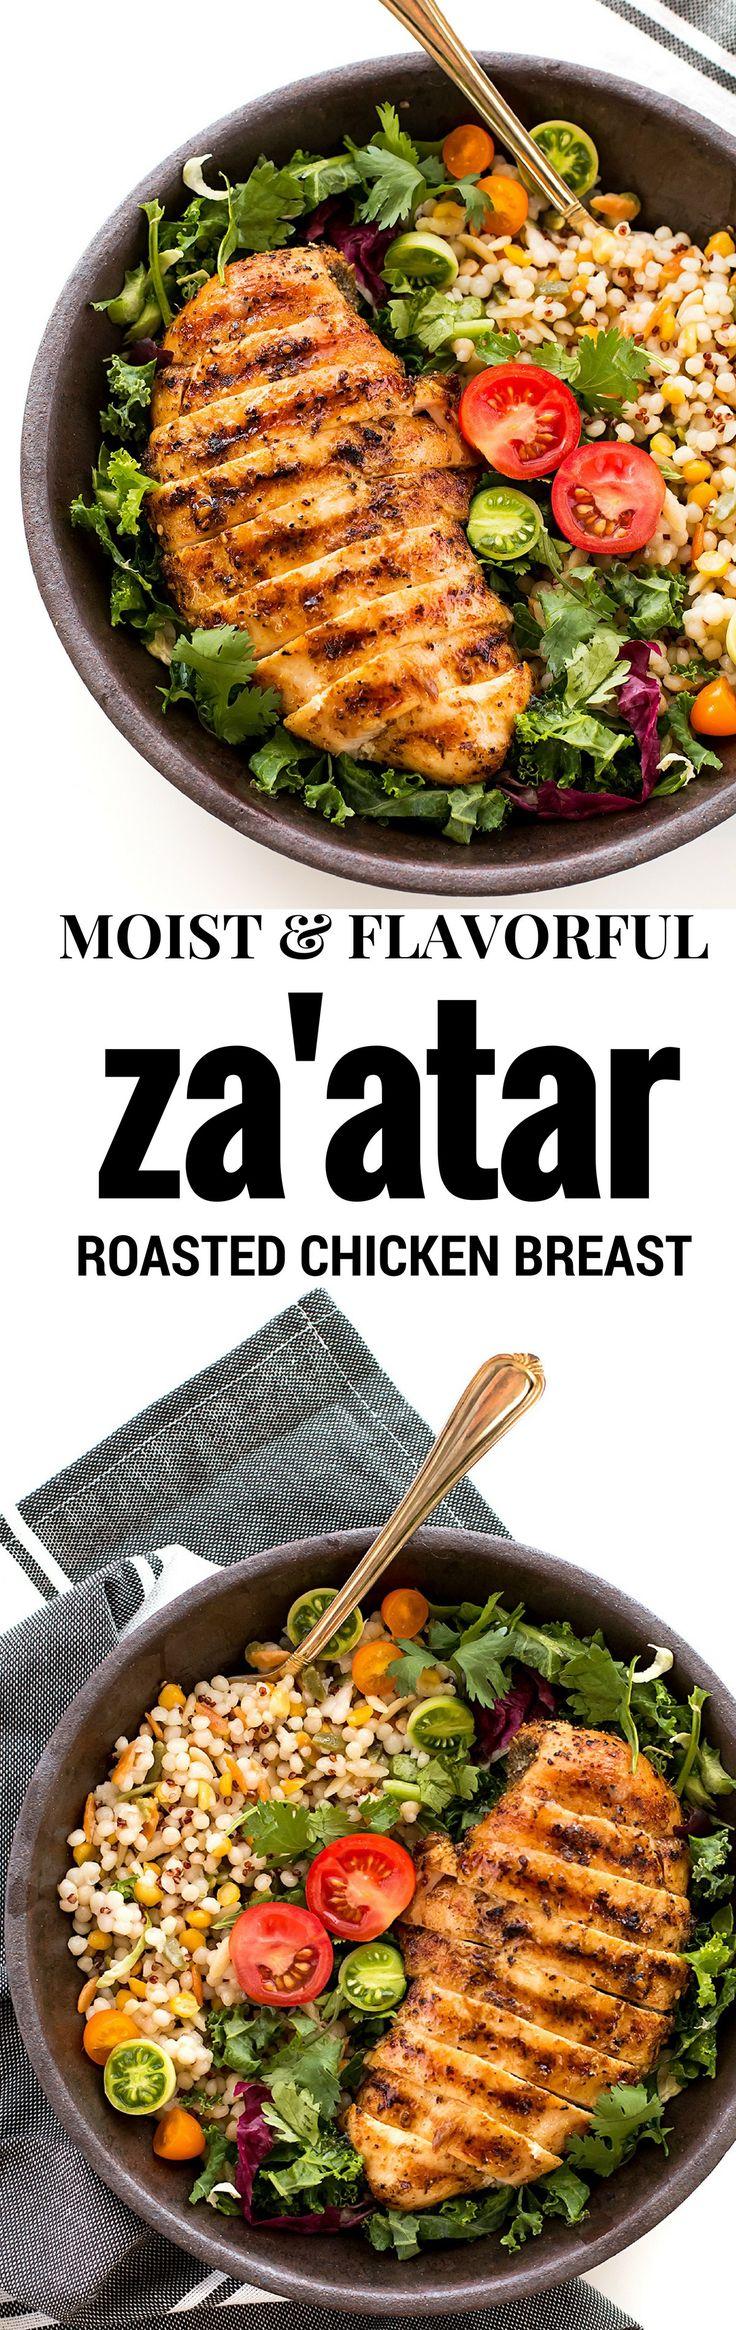 Blue apron za'atar spiced chicken - Easy Za Atar Roasted Chicken Breast